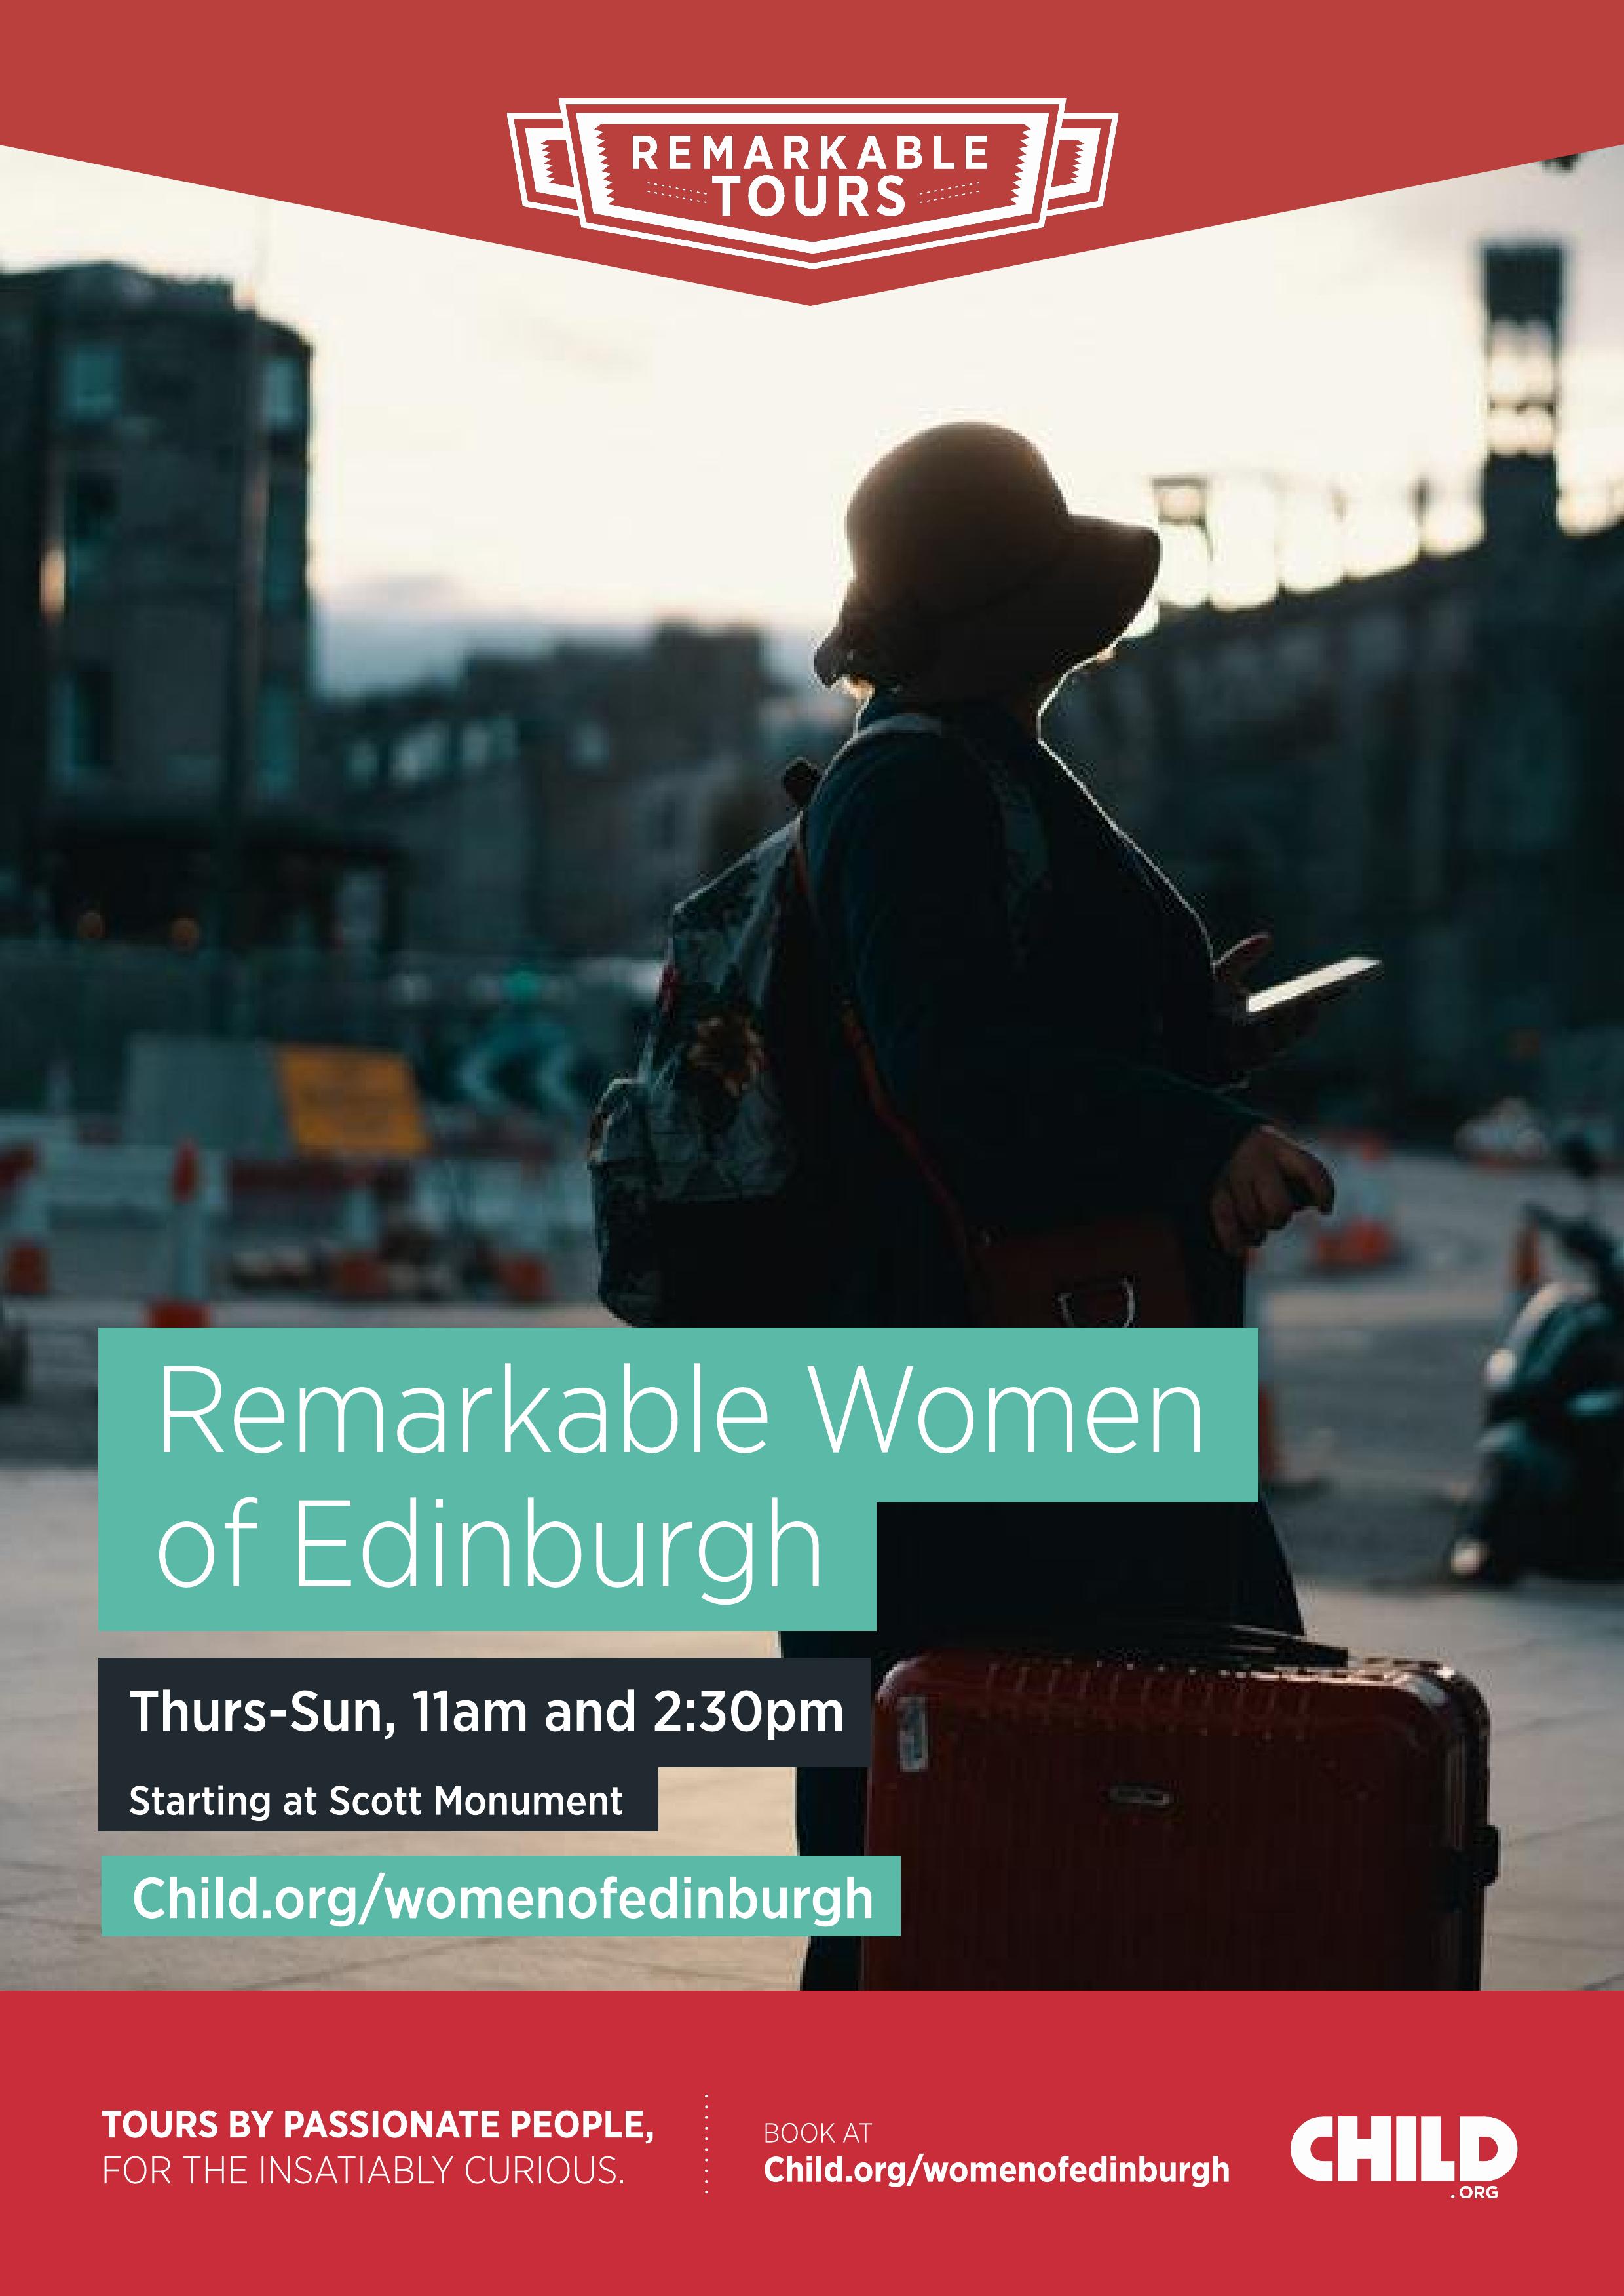 Remarkable Tours - The Remarkable Women of Edinburgh